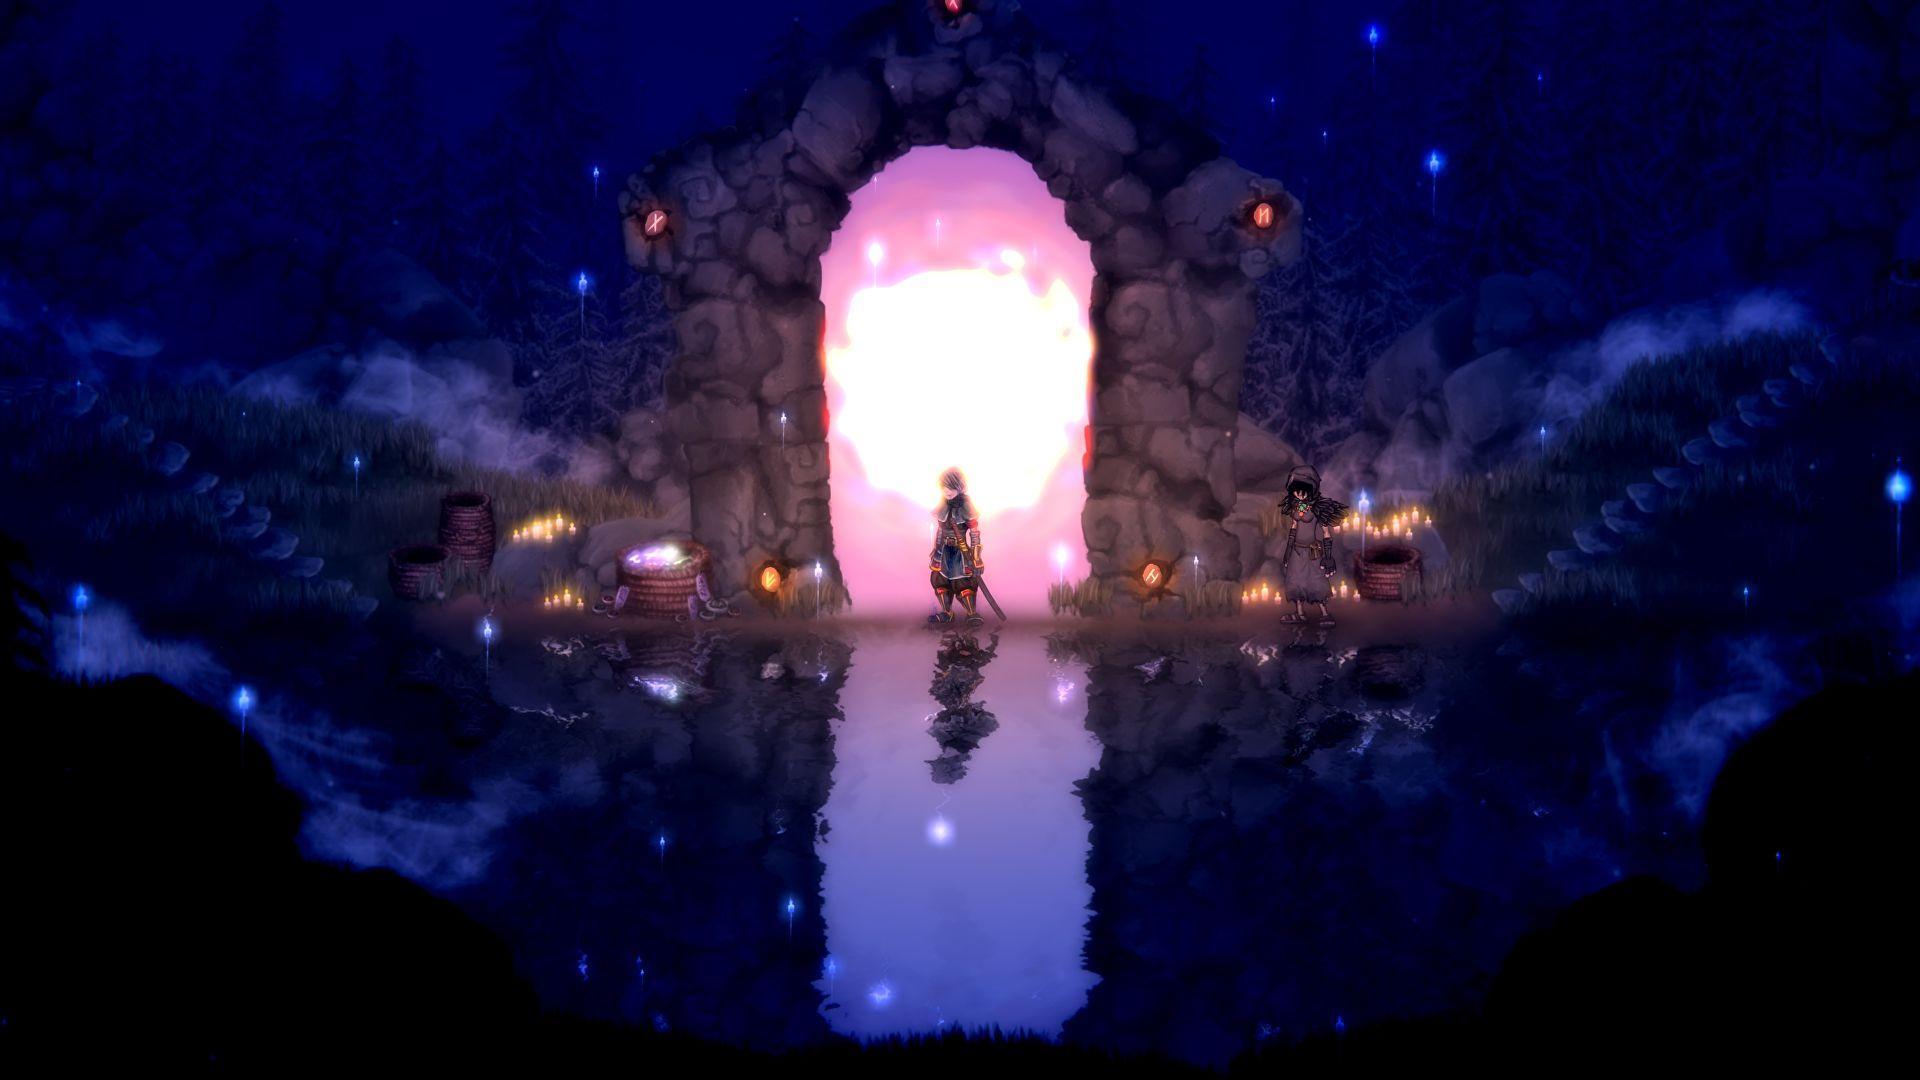 Salt and Sacrifice - продолжение Salt and Sanctuary анонсировано для PS5 и PC 2